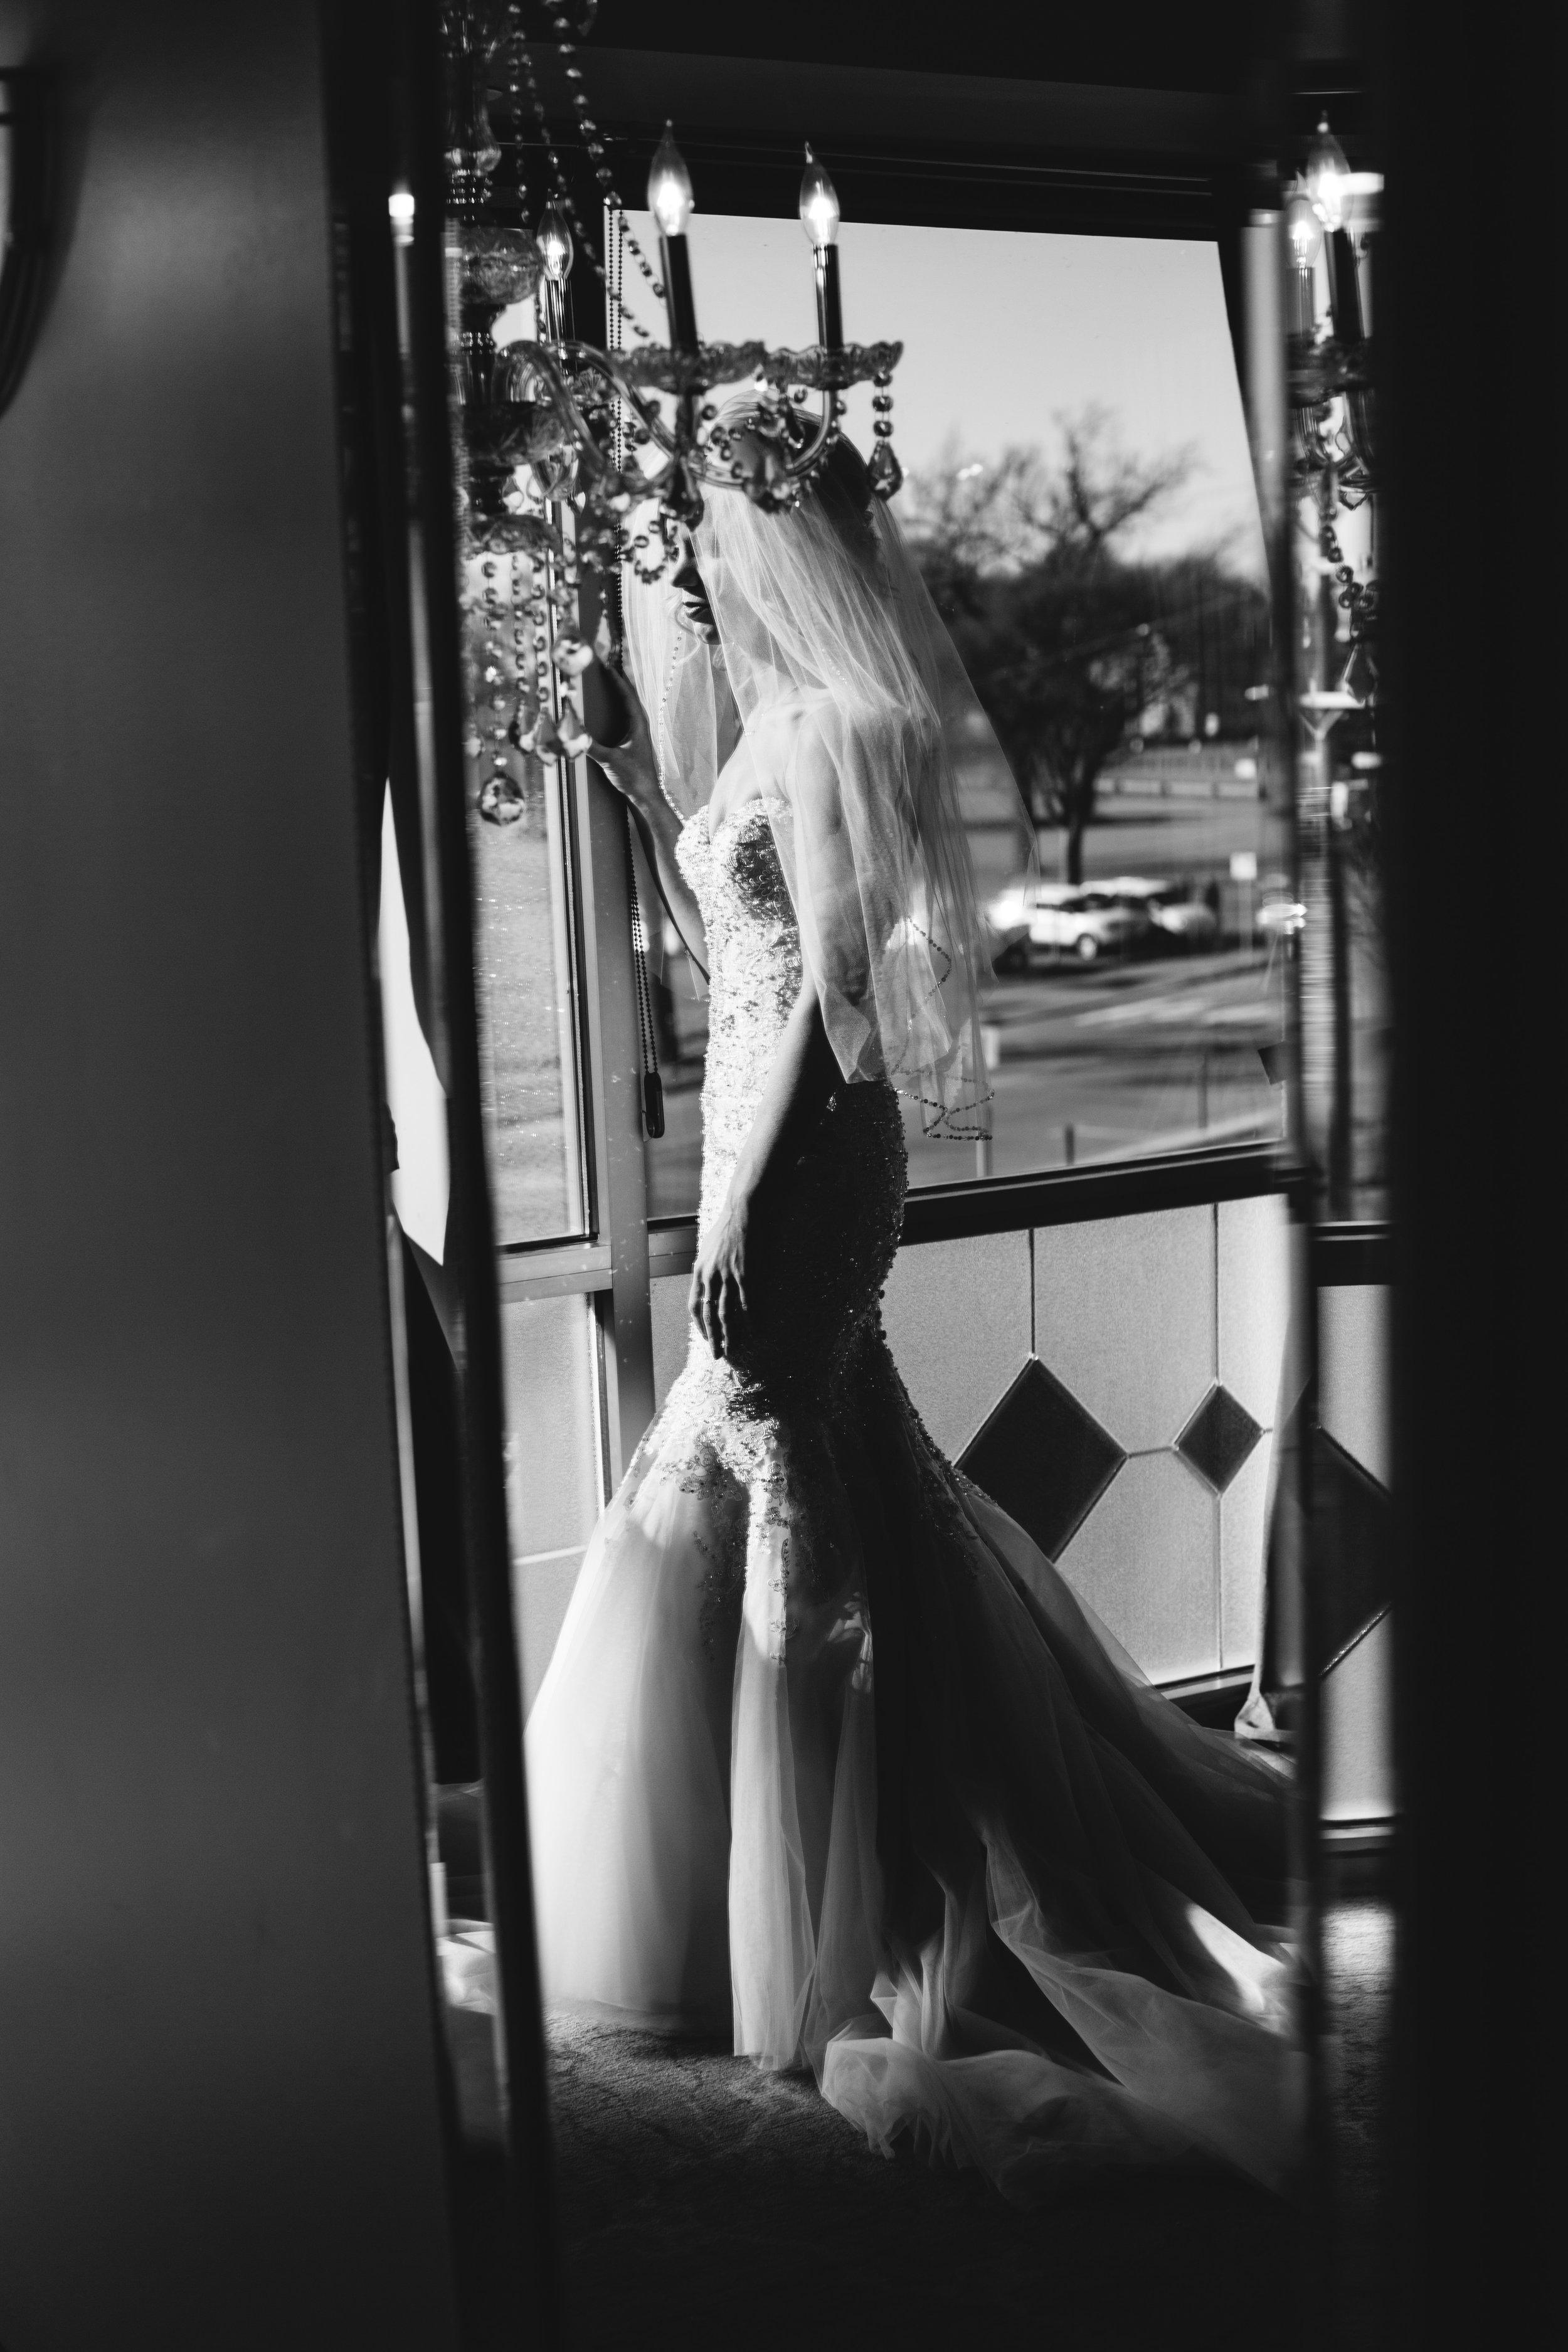 RachelandJustinwedding0098.jpg